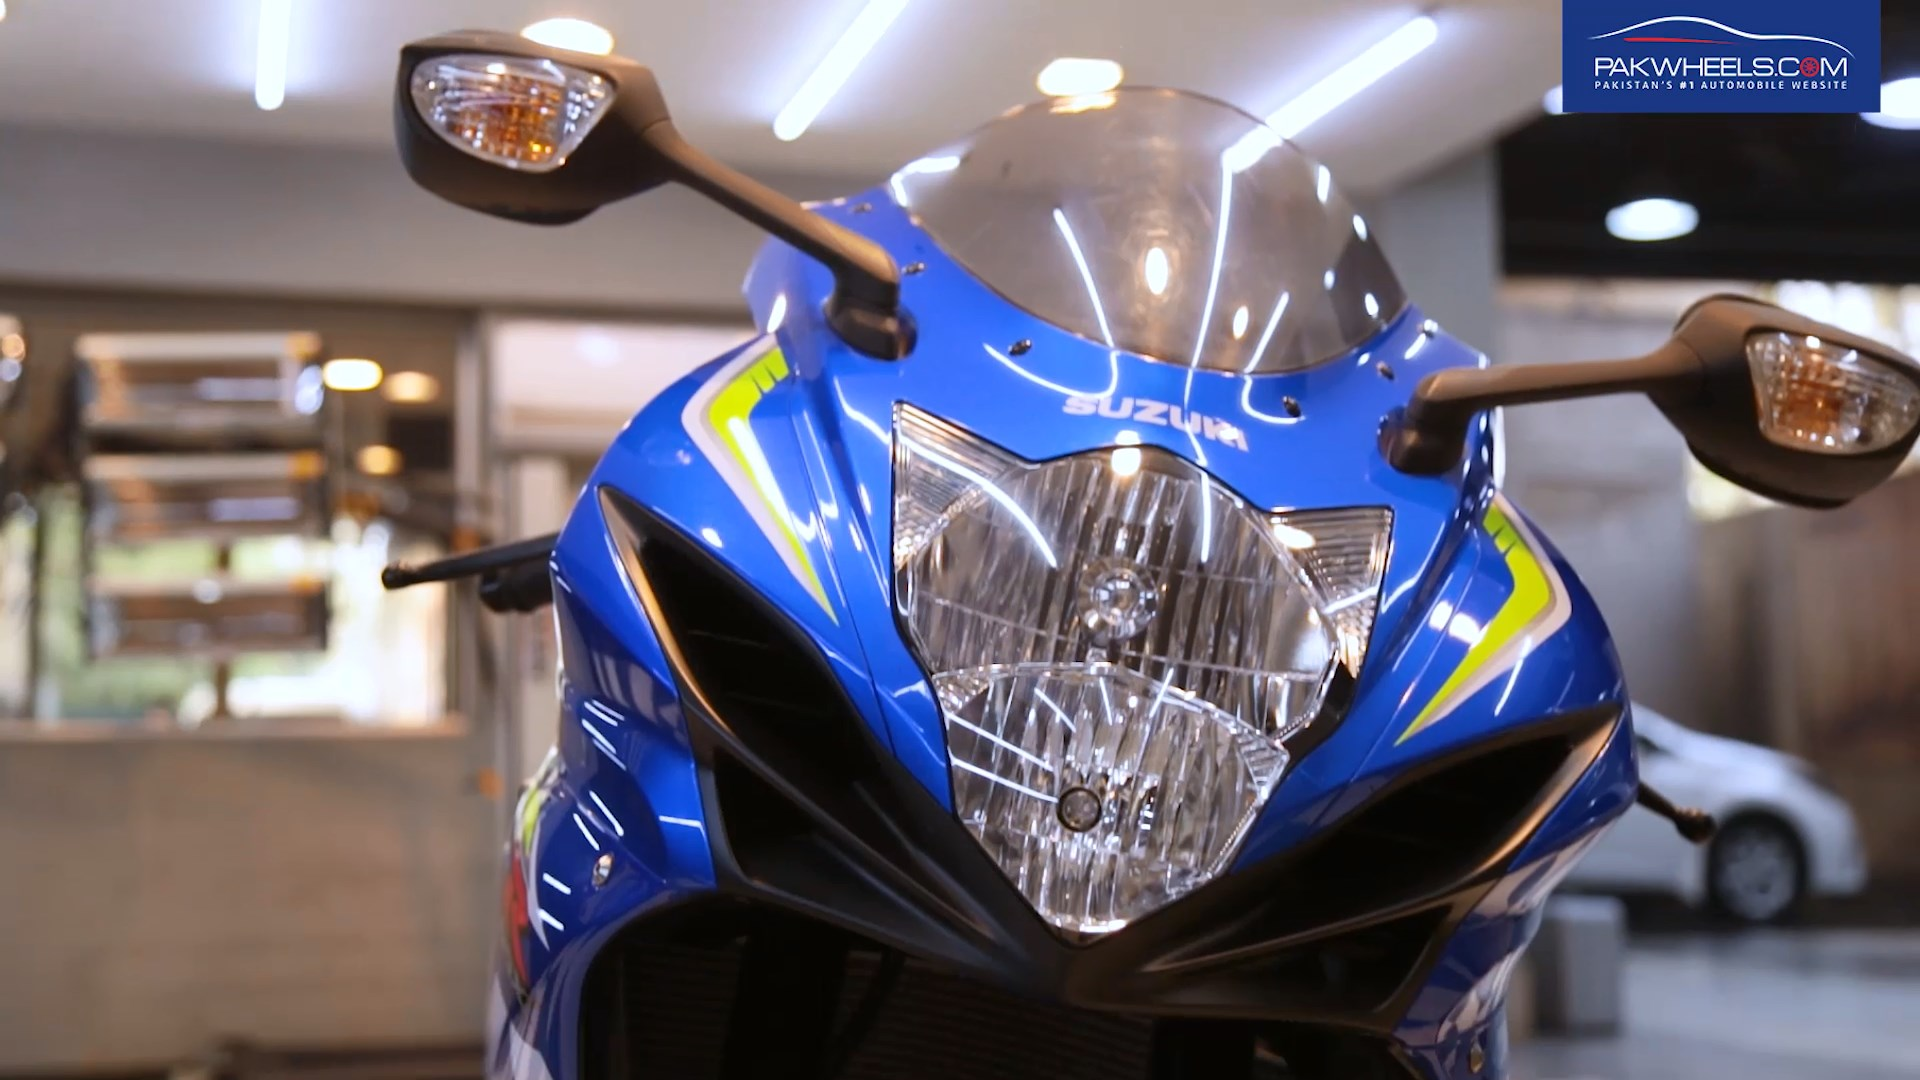 2018 Suzuki GSX-R 600 PakWheels Review